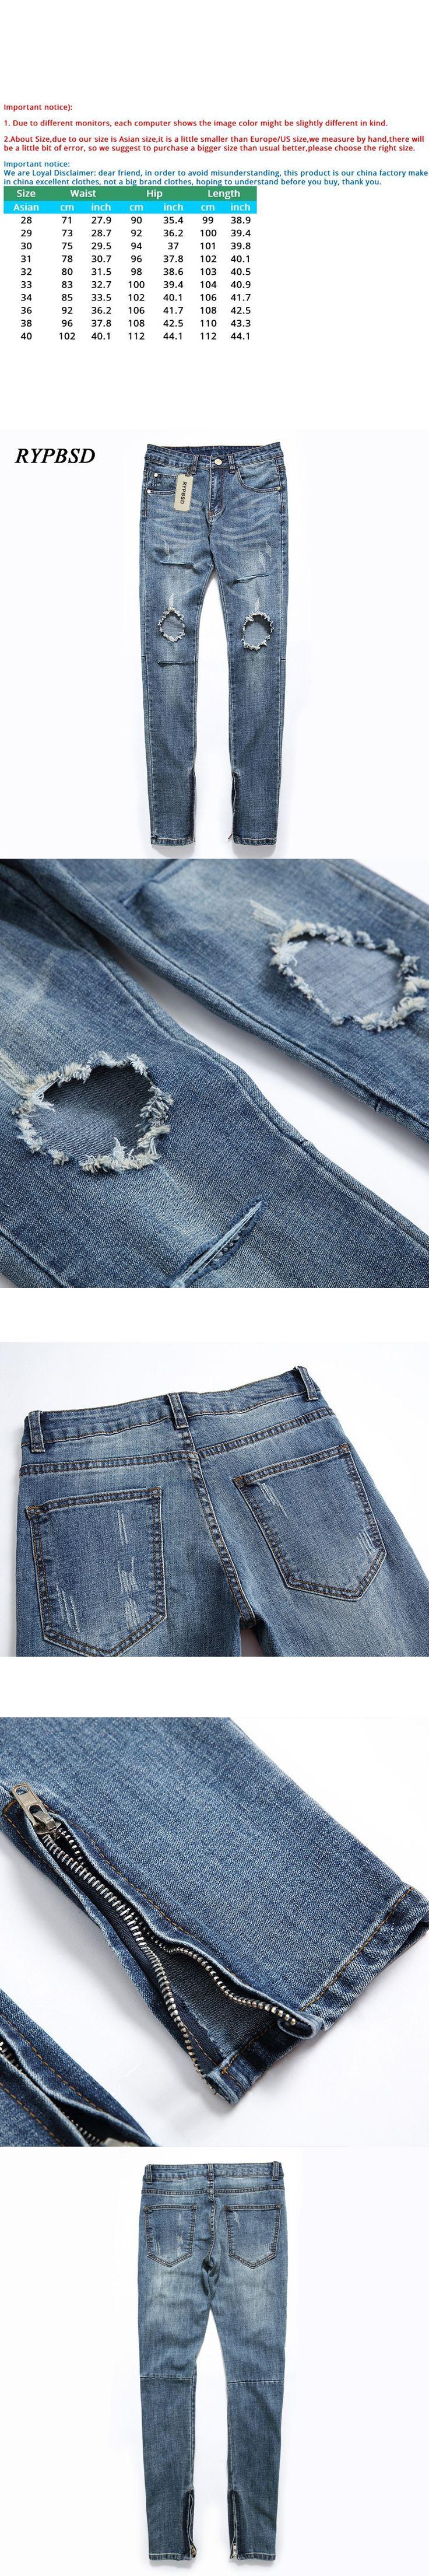 Fashion Vintage High Street Knee Hole Zipper Biker Jeans Men Distressed Skinny Slim Stretch Light Blue Beggar Jeans Pencil Pants